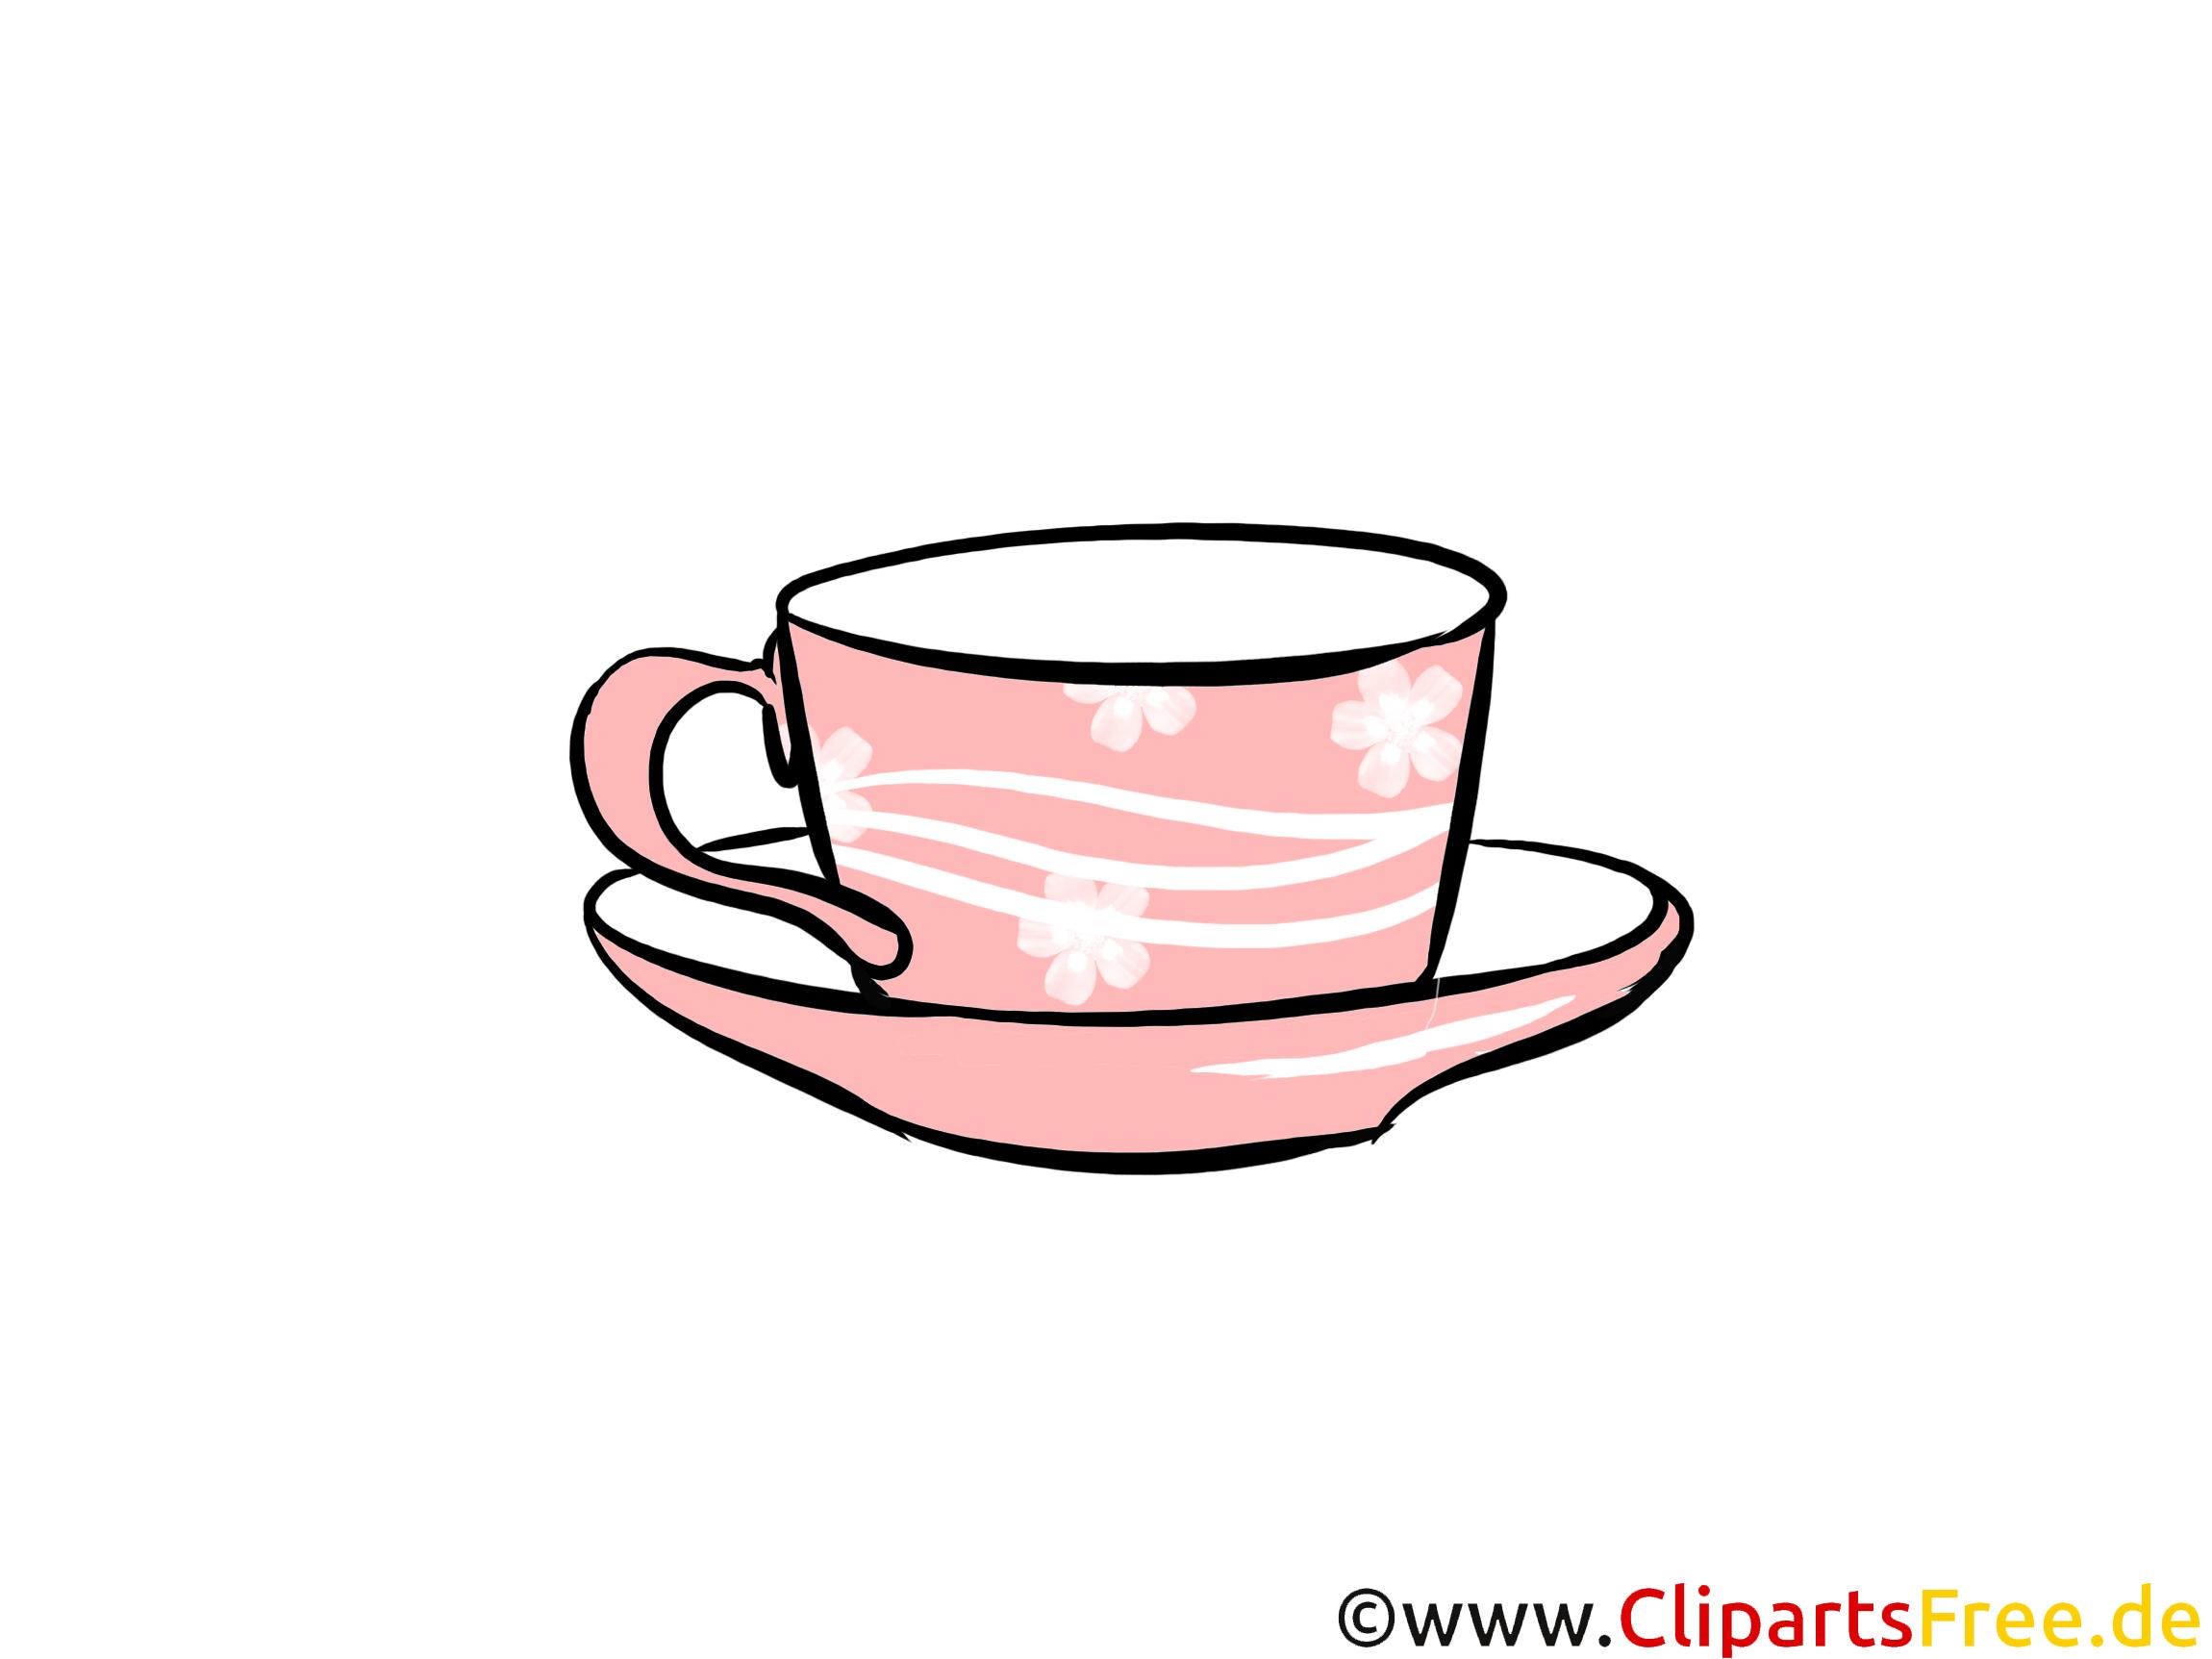 Tasse mit Unterteller Illustration, Clipart, Bild